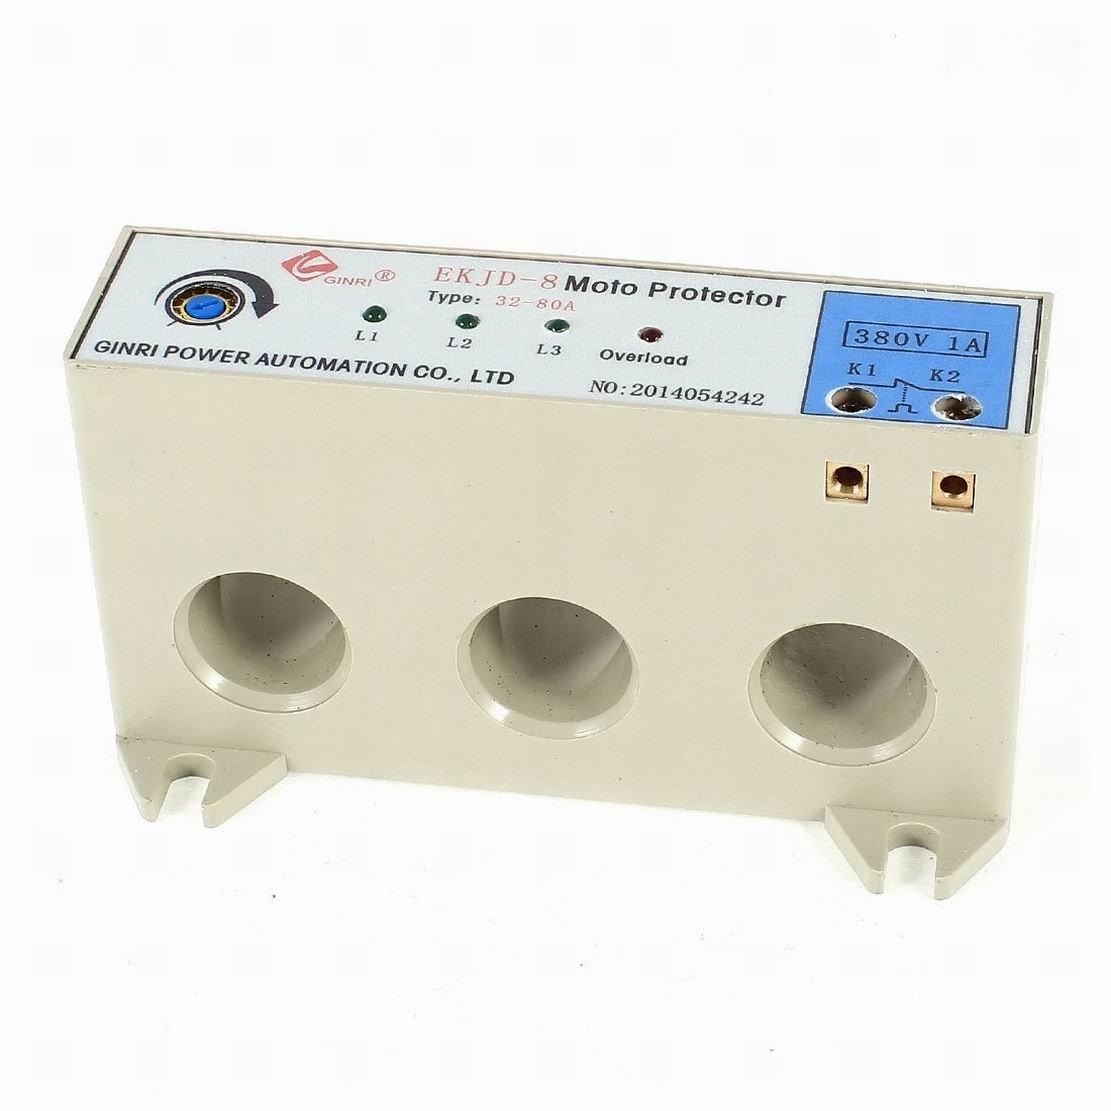 Uptell EKJD-9 3 Phase 32-80A Adjustable Current Motor Circuit Protector